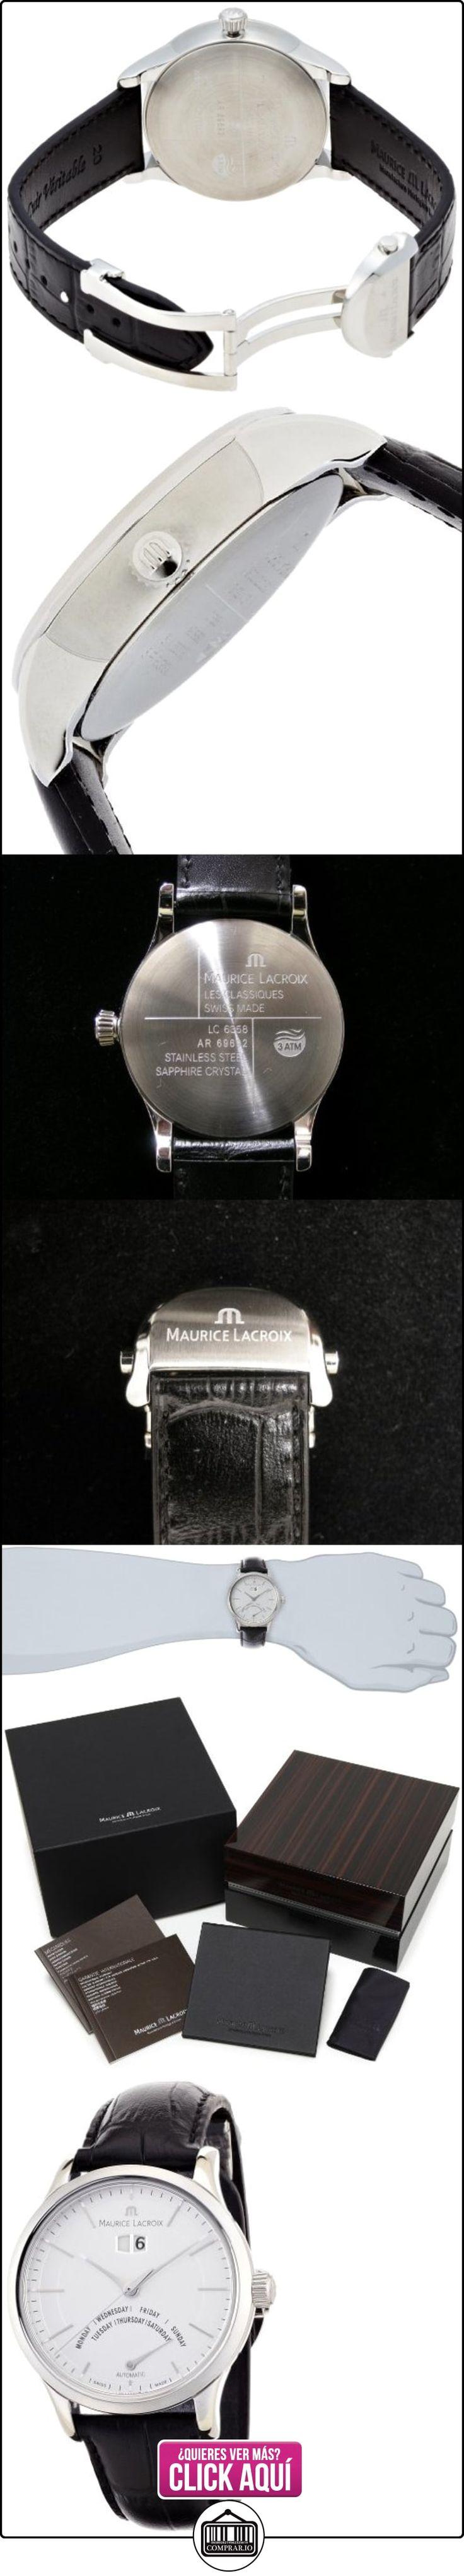 Reloj Maurice Lacroix Les Classiques Jour Rétrograde LC6358-SS001-13E  ✿ Relojes para hombre - (Lujo) ✿ ▬► Ver oferta: http://comprar.io/goto/B005SYDNQ6